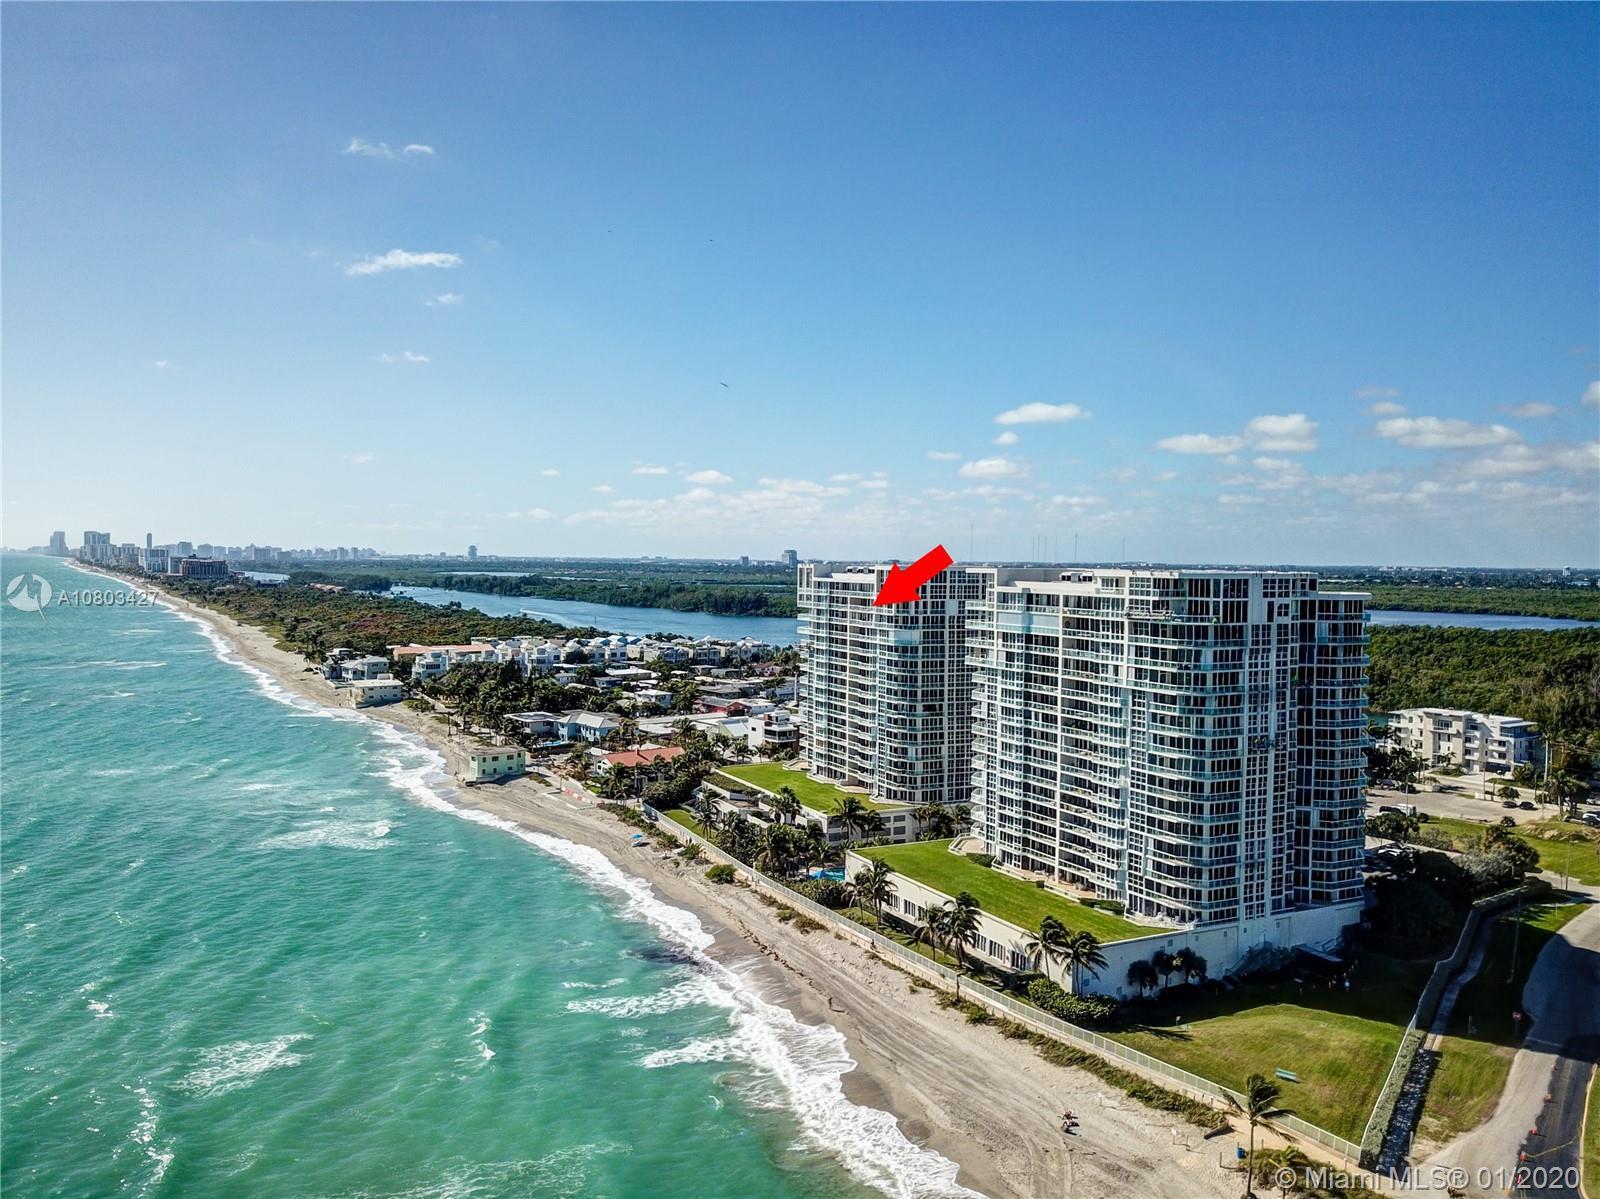 6001 N Ocean Dr, 1707 - Hollywood, Florida